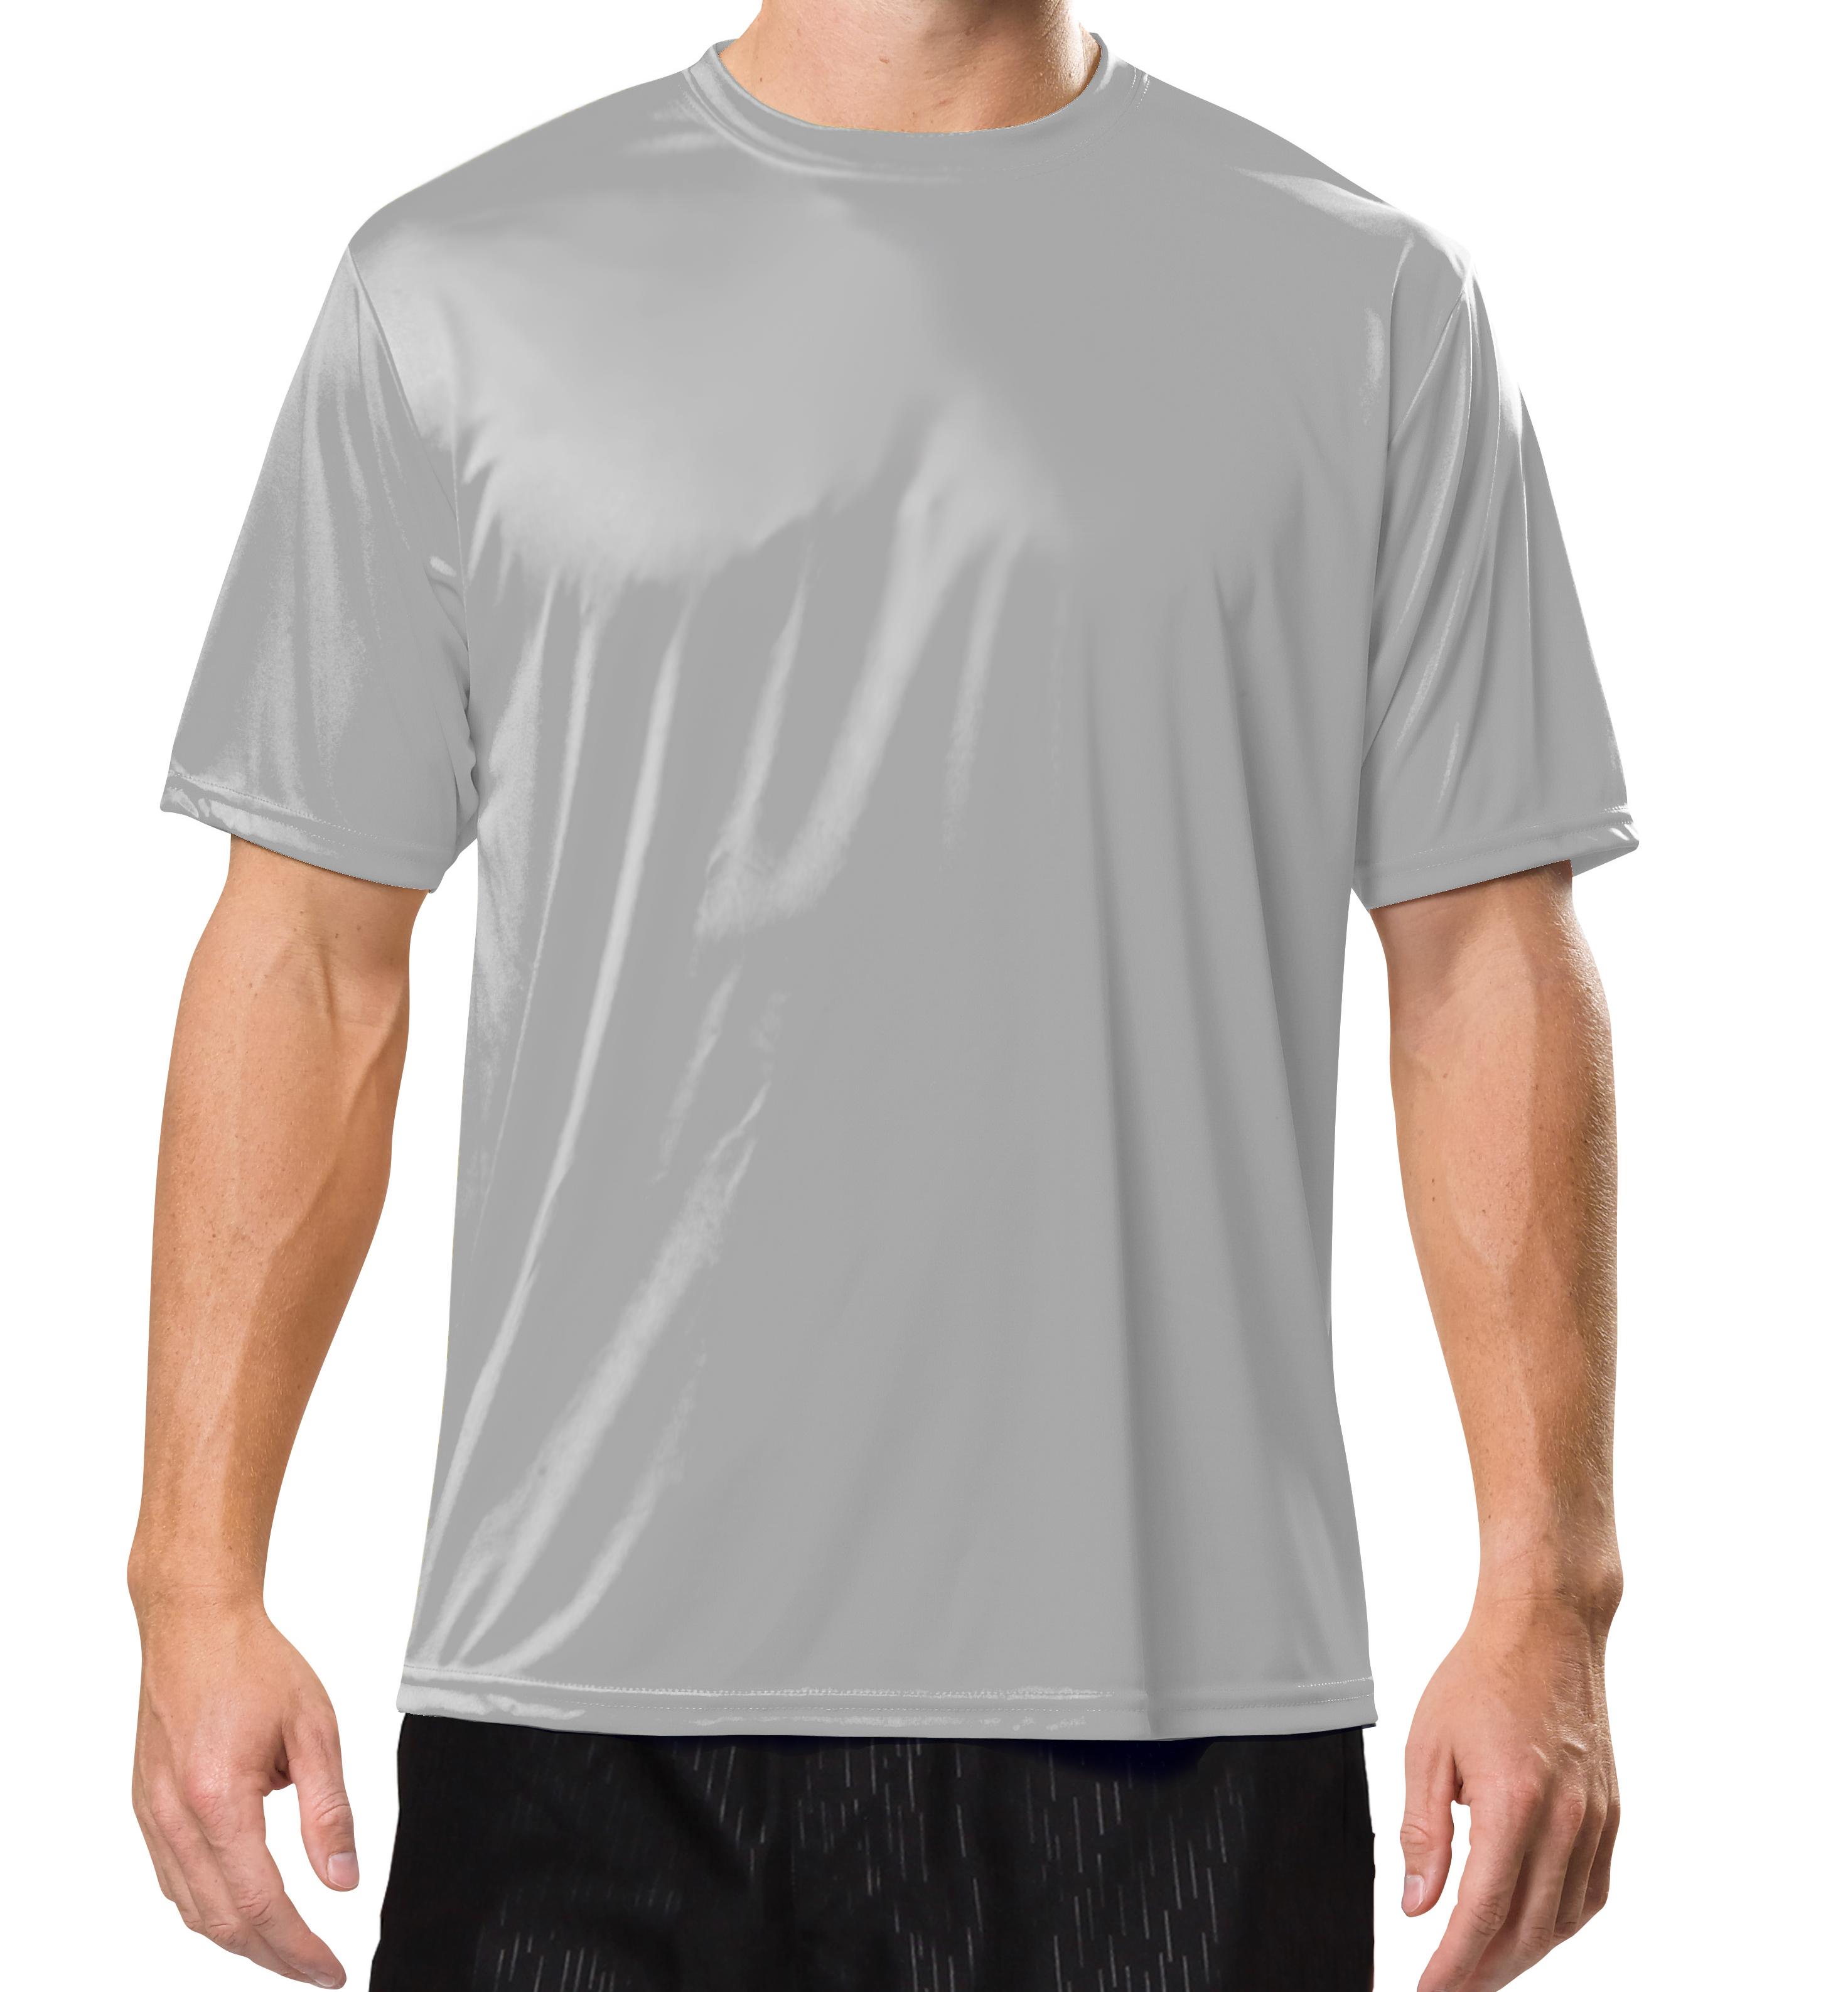 Mens-Rash-Guard-Surf-Swimwear-Swim-Shirt-SPF-Sun-Protection-Loose-Fit-Fitting thumbnail 52